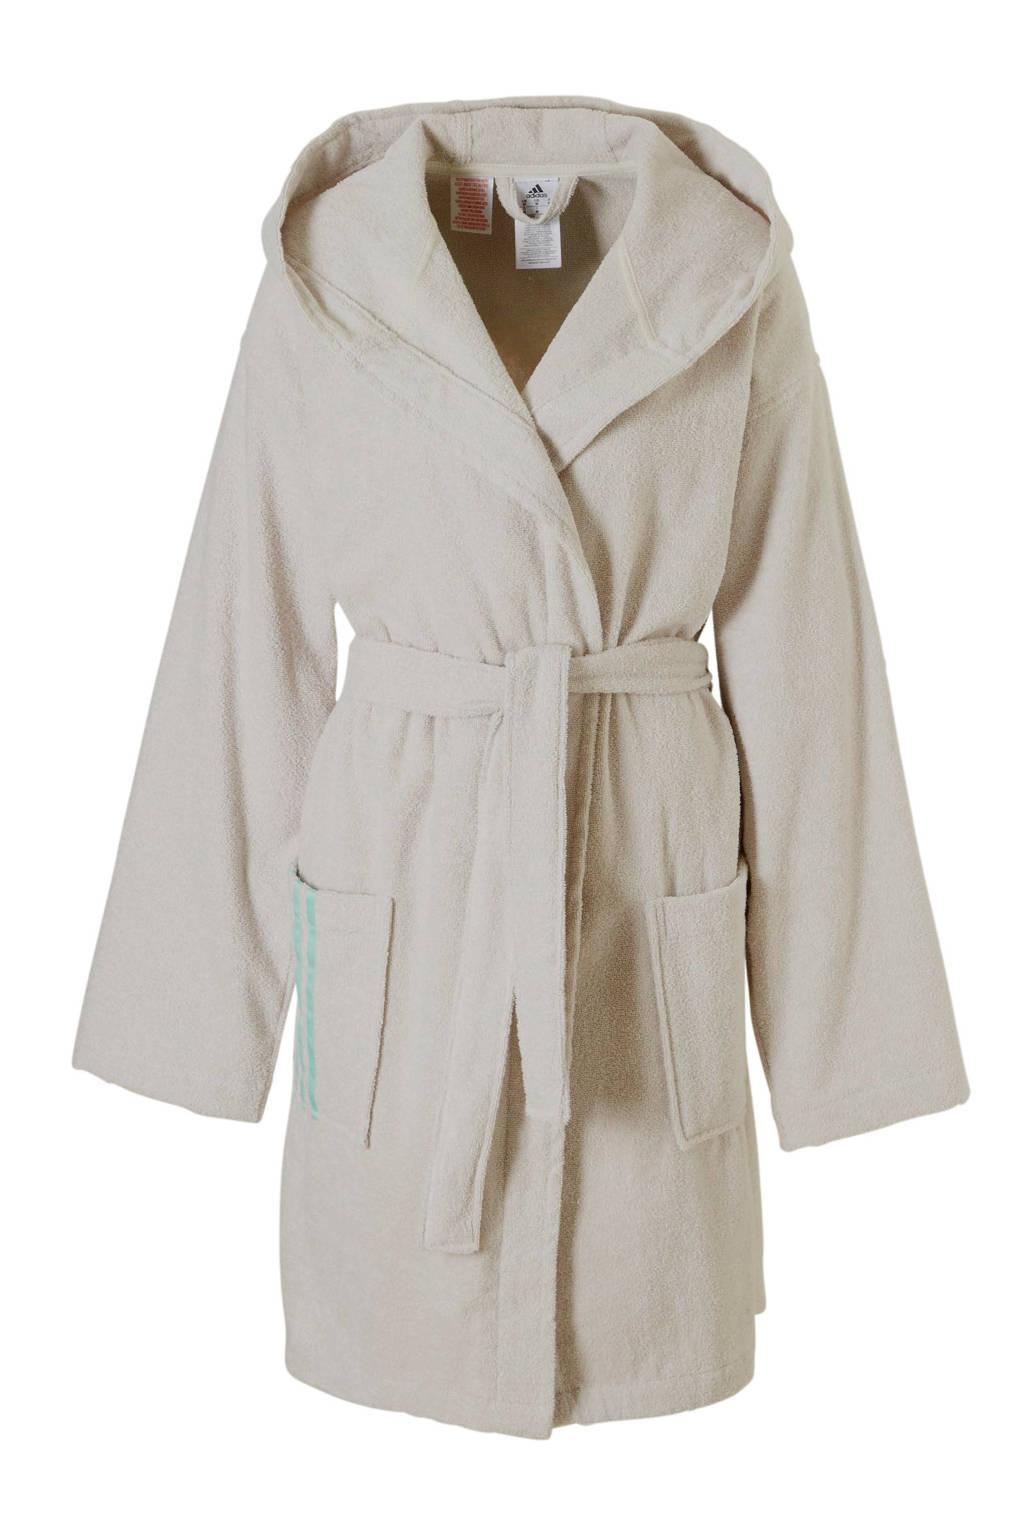 cf706399e23 adidas badstof badjas met capuchon beige | wehkamp